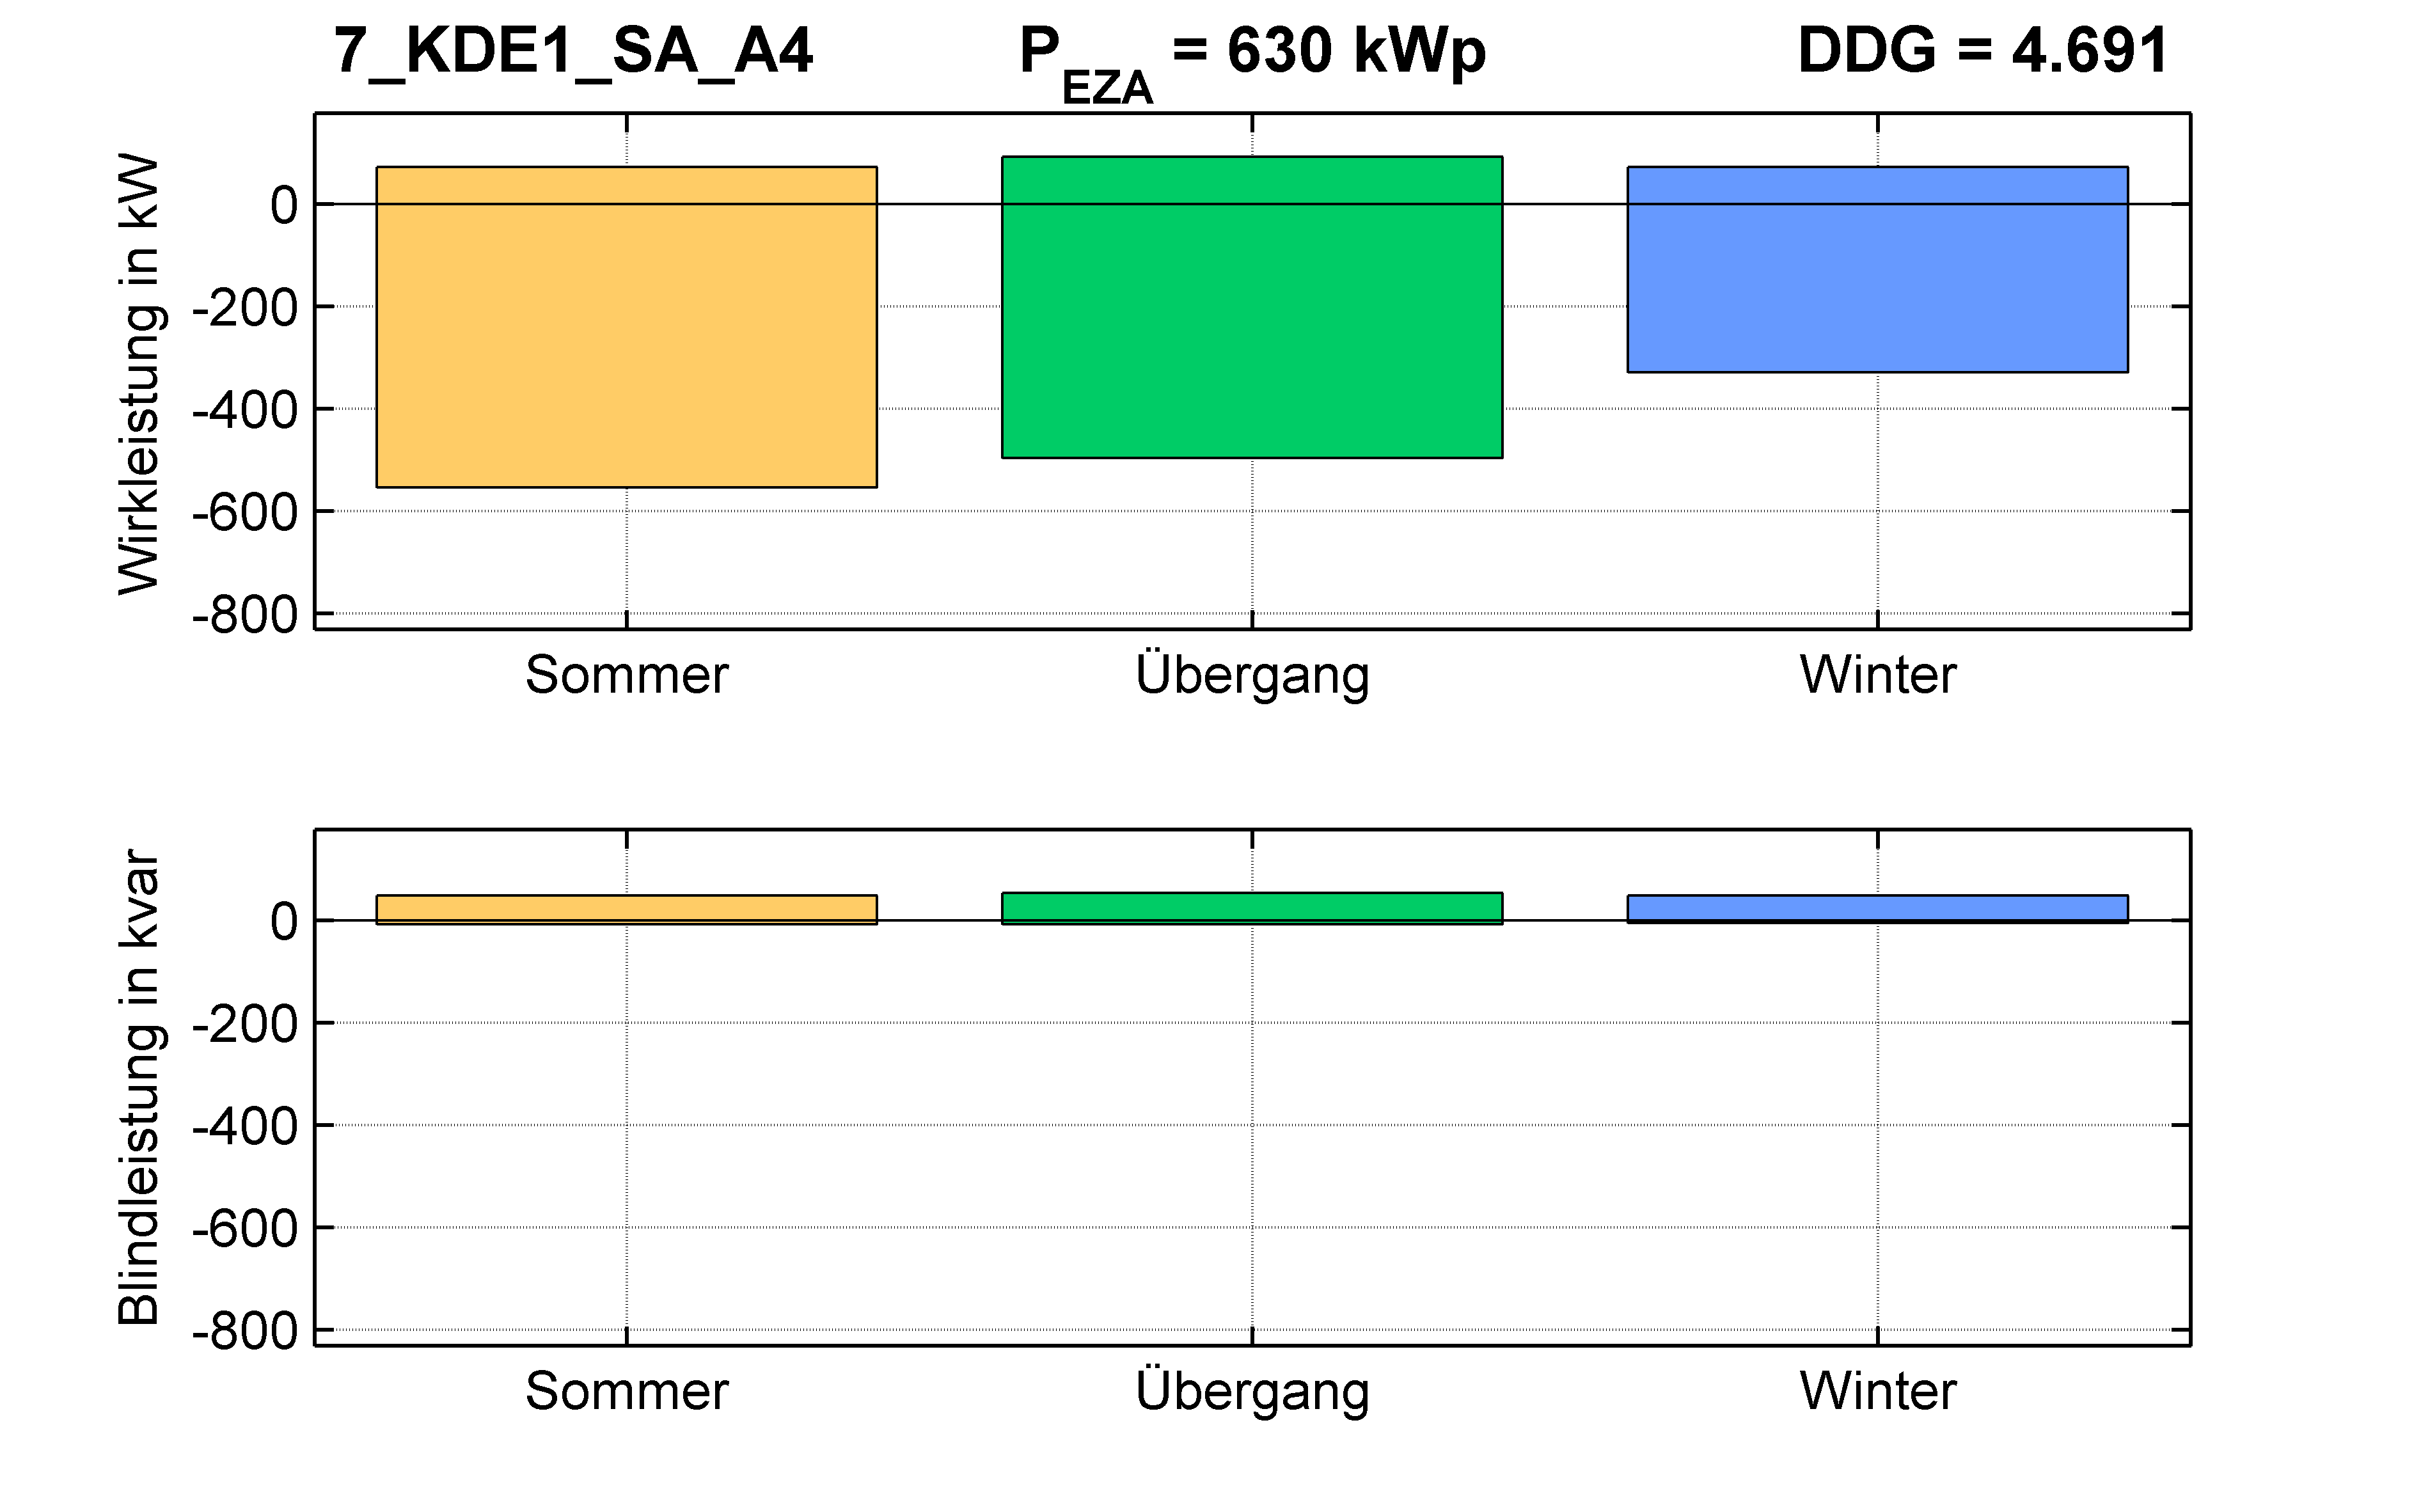 KDE1 | Längsregler (SA) A4 | PQ-Bilanz